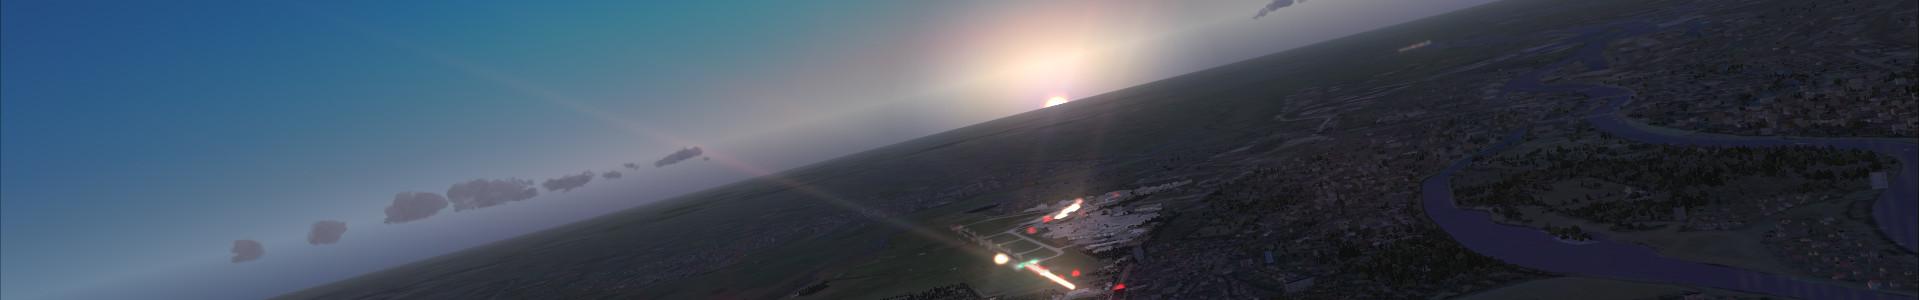 FSX Simulator Bild EDDW